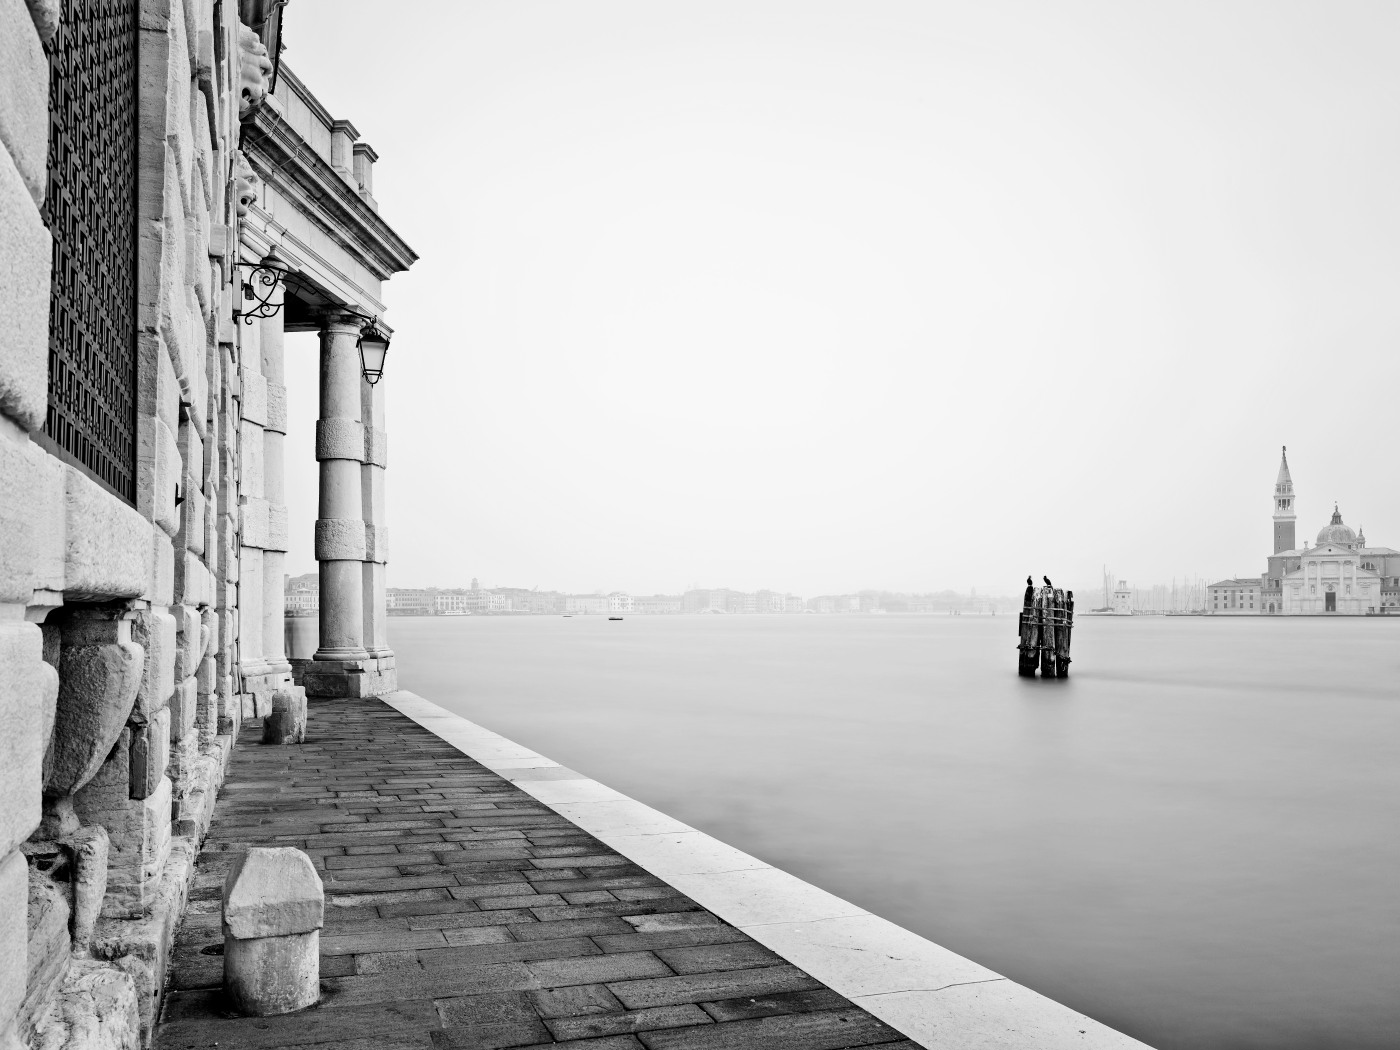 Dürr Venezia 2015